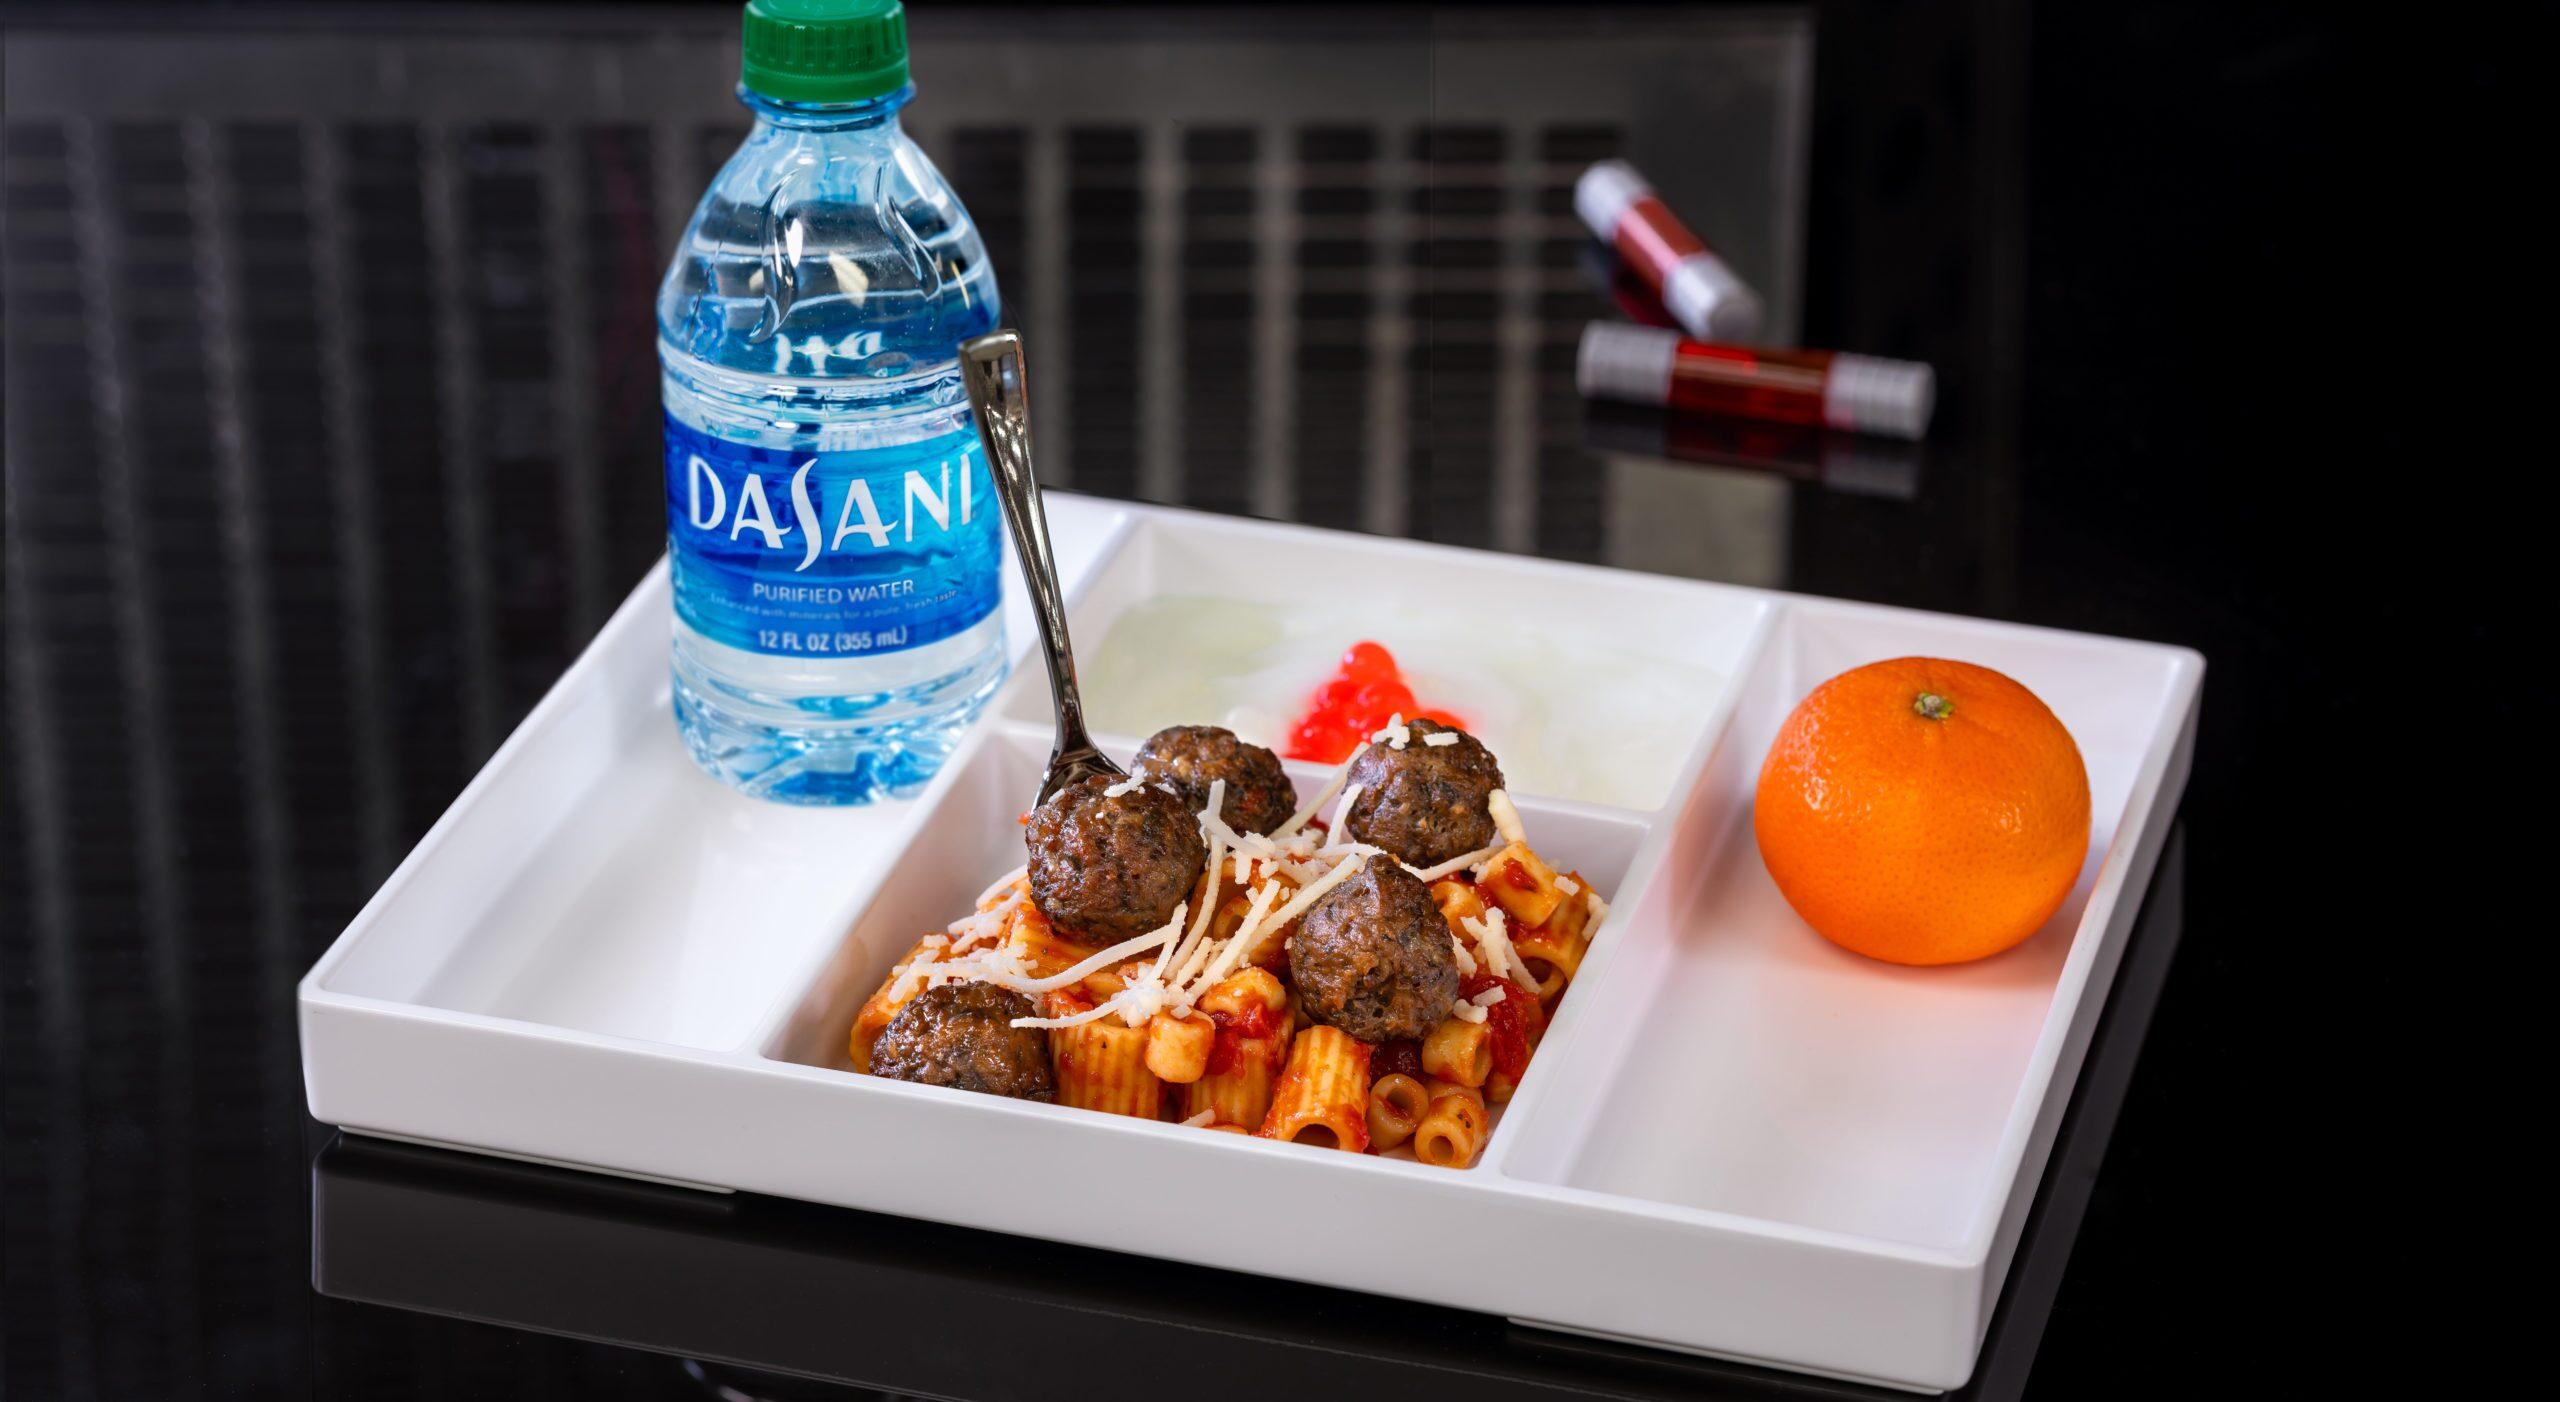 Avengers Campus Food & Beverage Ð Mini Pasta & Impossible Meat-balls